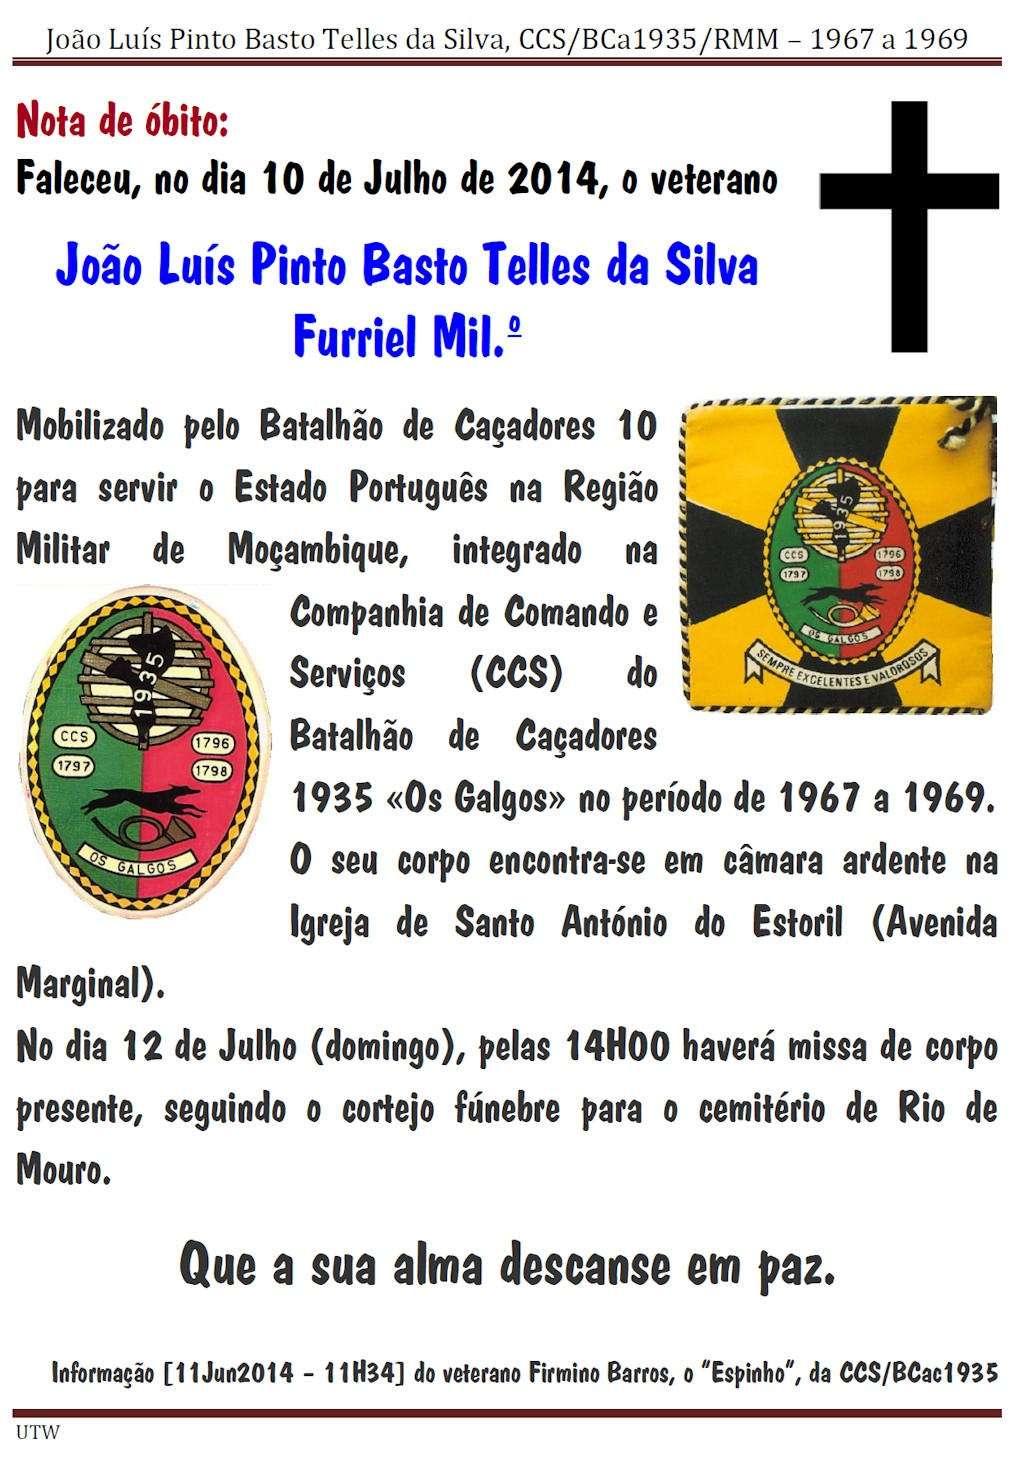 Faleceu o veterano João Luís Pinto Basto Telles da Silva, Furriel Mil.º da CCS/BCac1935 - 10Jul2014 Joaolu10